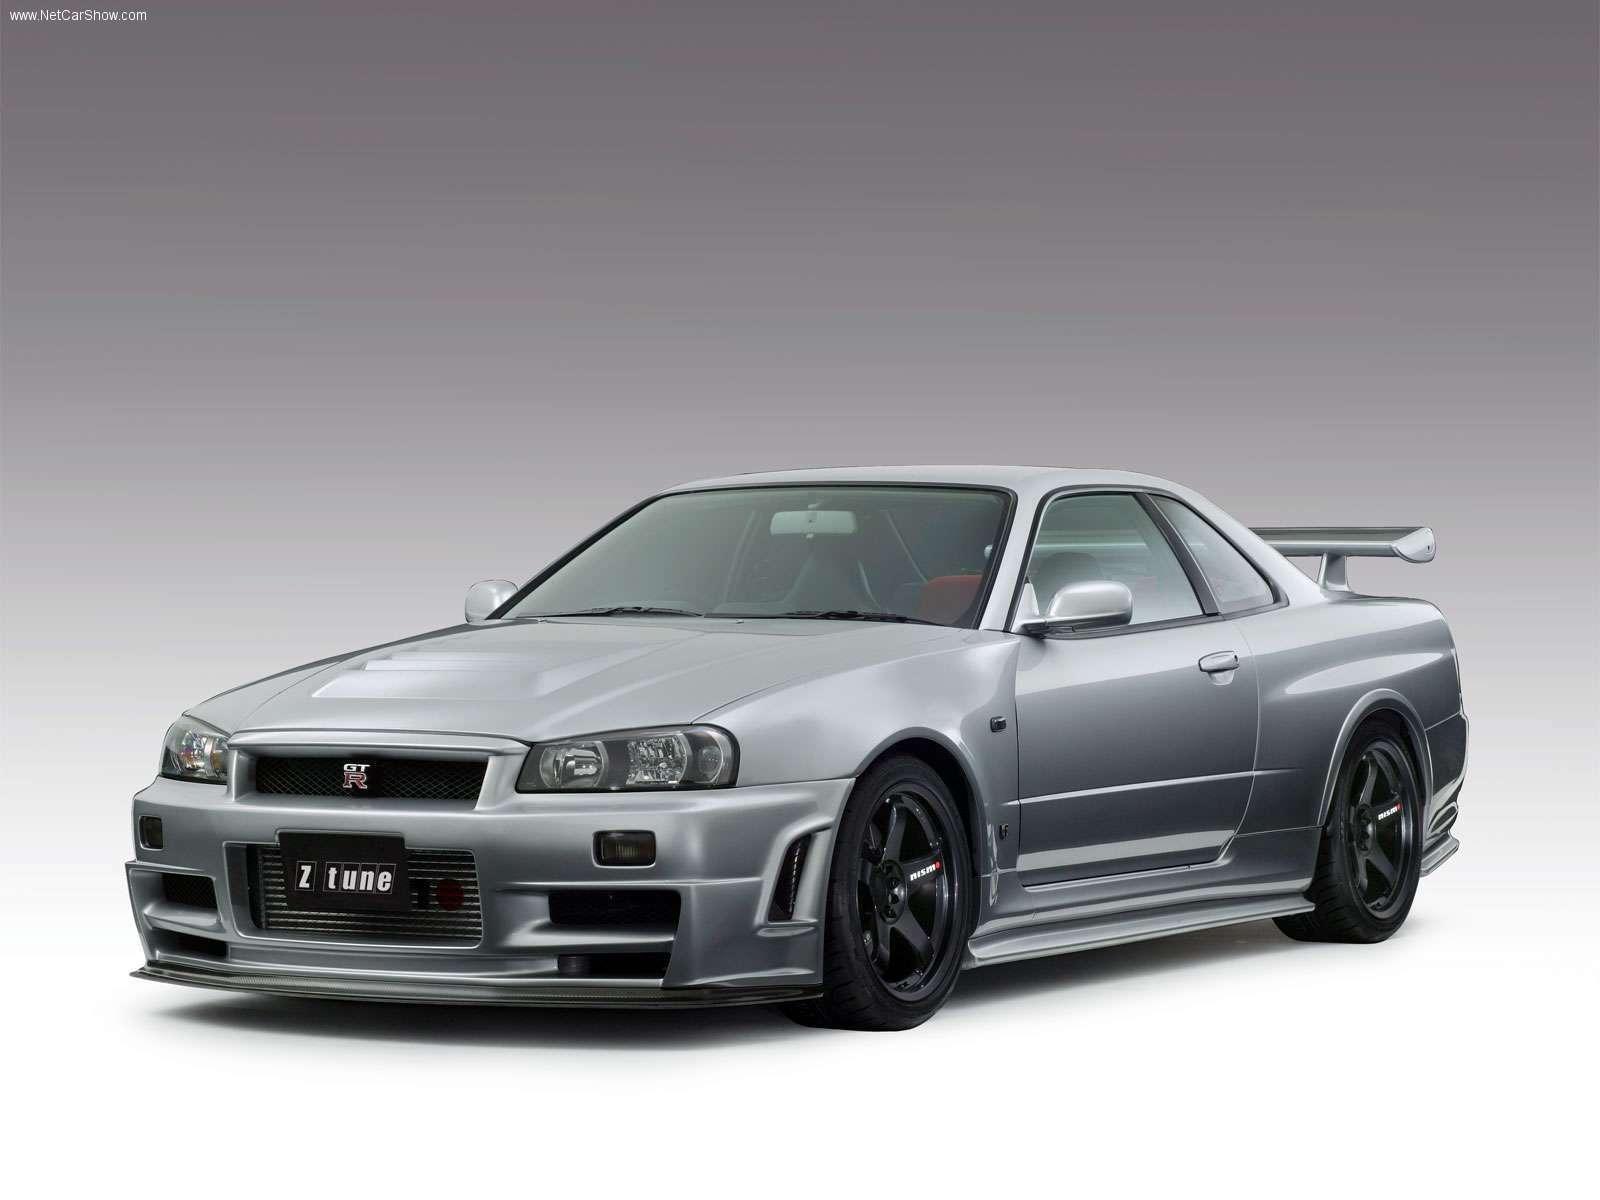 http://2.bp.blogspot.com/-BUSgqsLnKvQ/Tx6HzLt5gUI/AAAAAAAAOBw/3biSomVBfa4/s1600/Nismo-Nissan_Skyline_R34_GTR_Z_Tune_2005_1600x1200_wallpaper_05.jpg